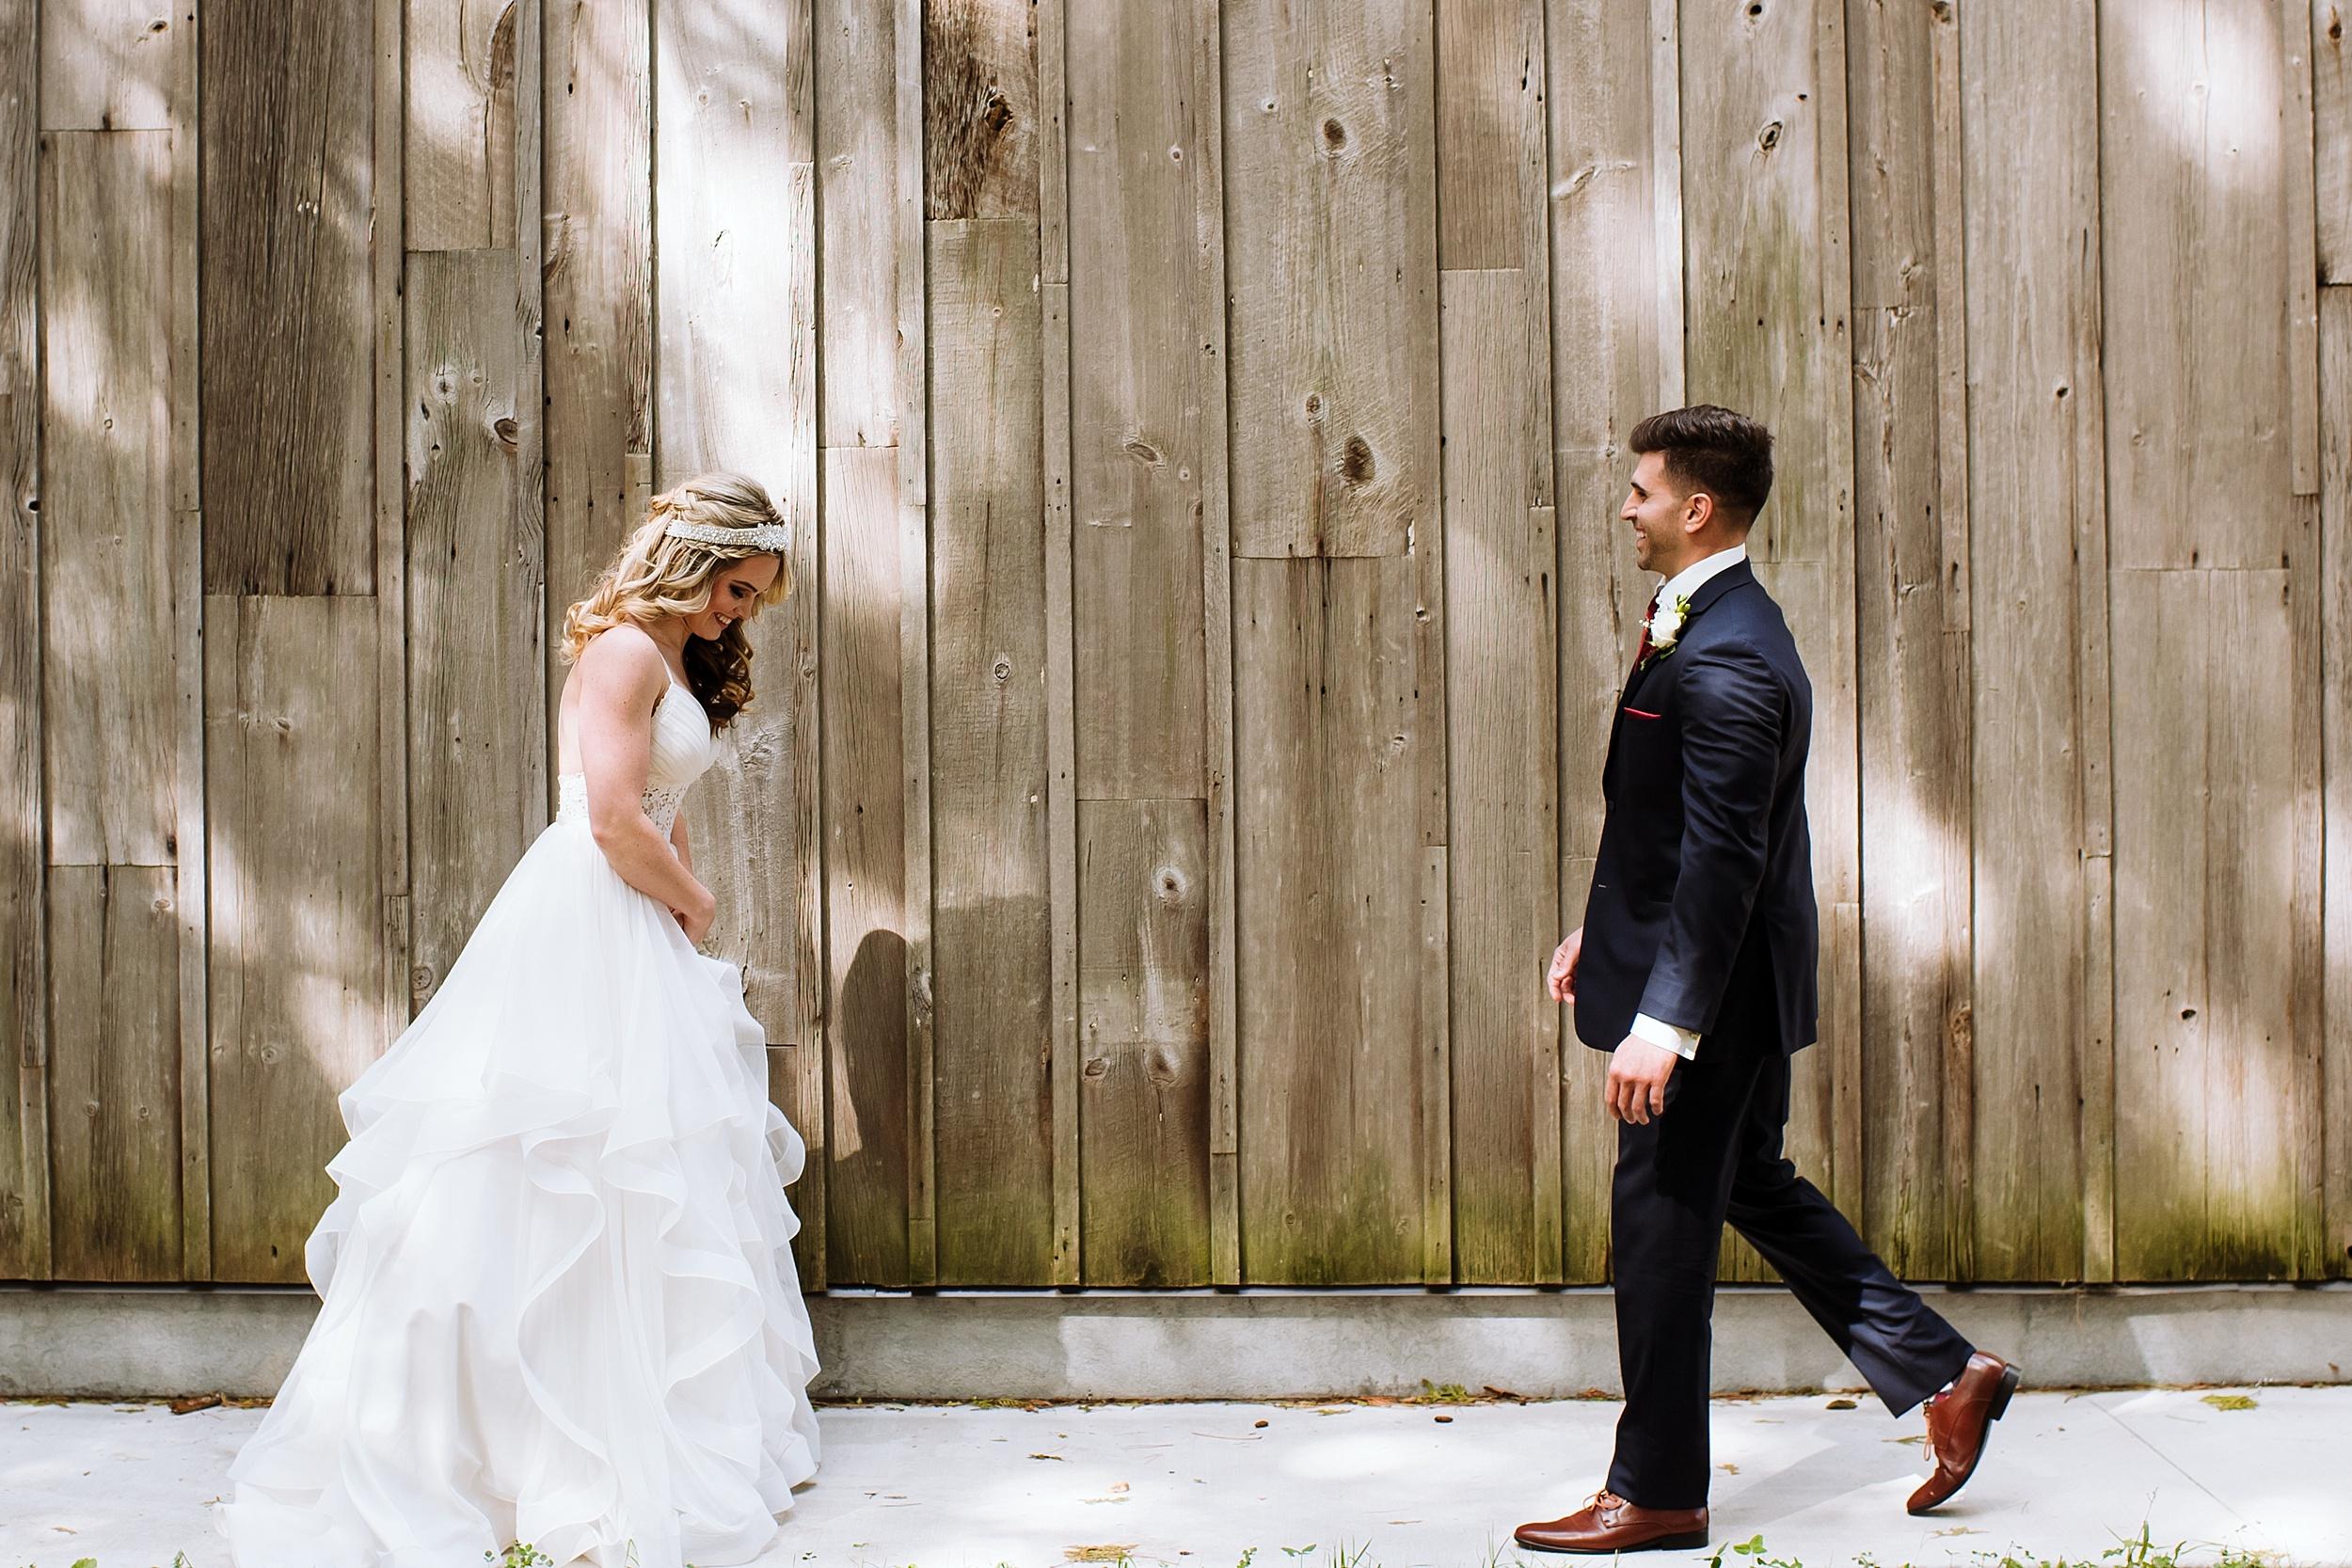 McMichael_Art_Collection_Wedding_chateau_le_jardin_Justine_Munro_Toronto_Photographer007.jpg